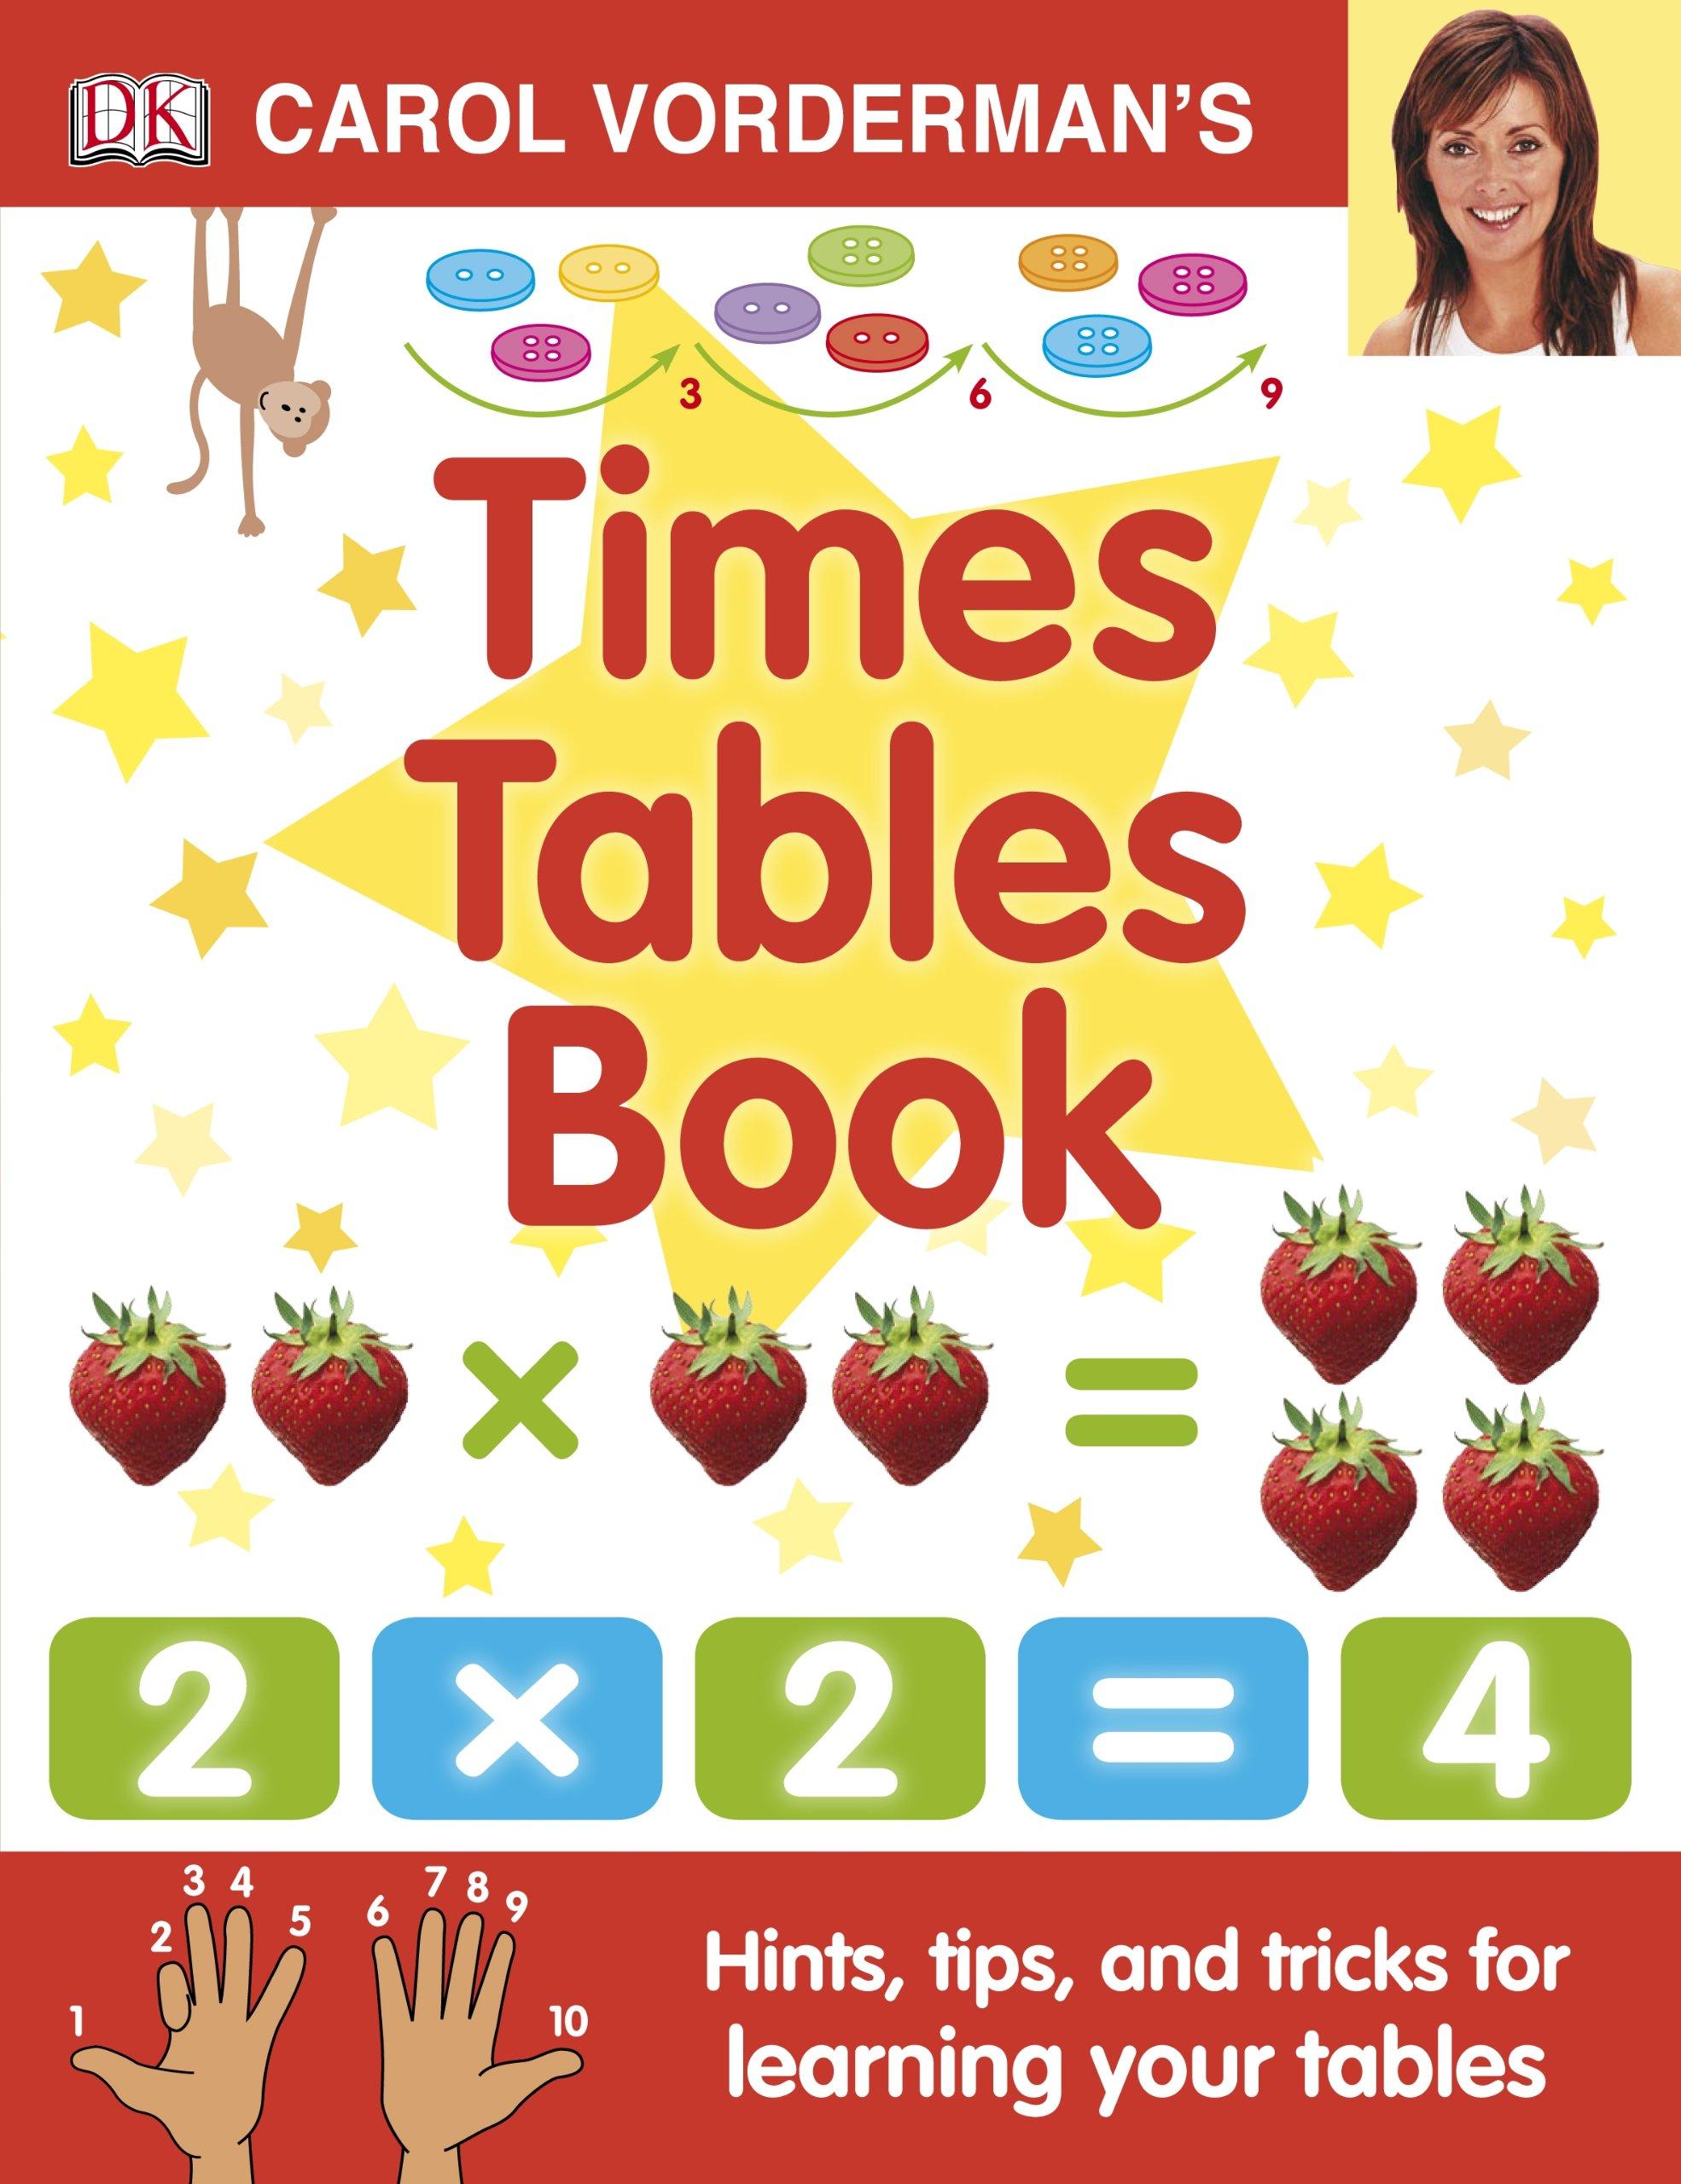 Carol vordermans times tables book made easy amazon carol vordermans times tables book made easy amazon carol vorderman 9781405341363 books gamestrikefo Images